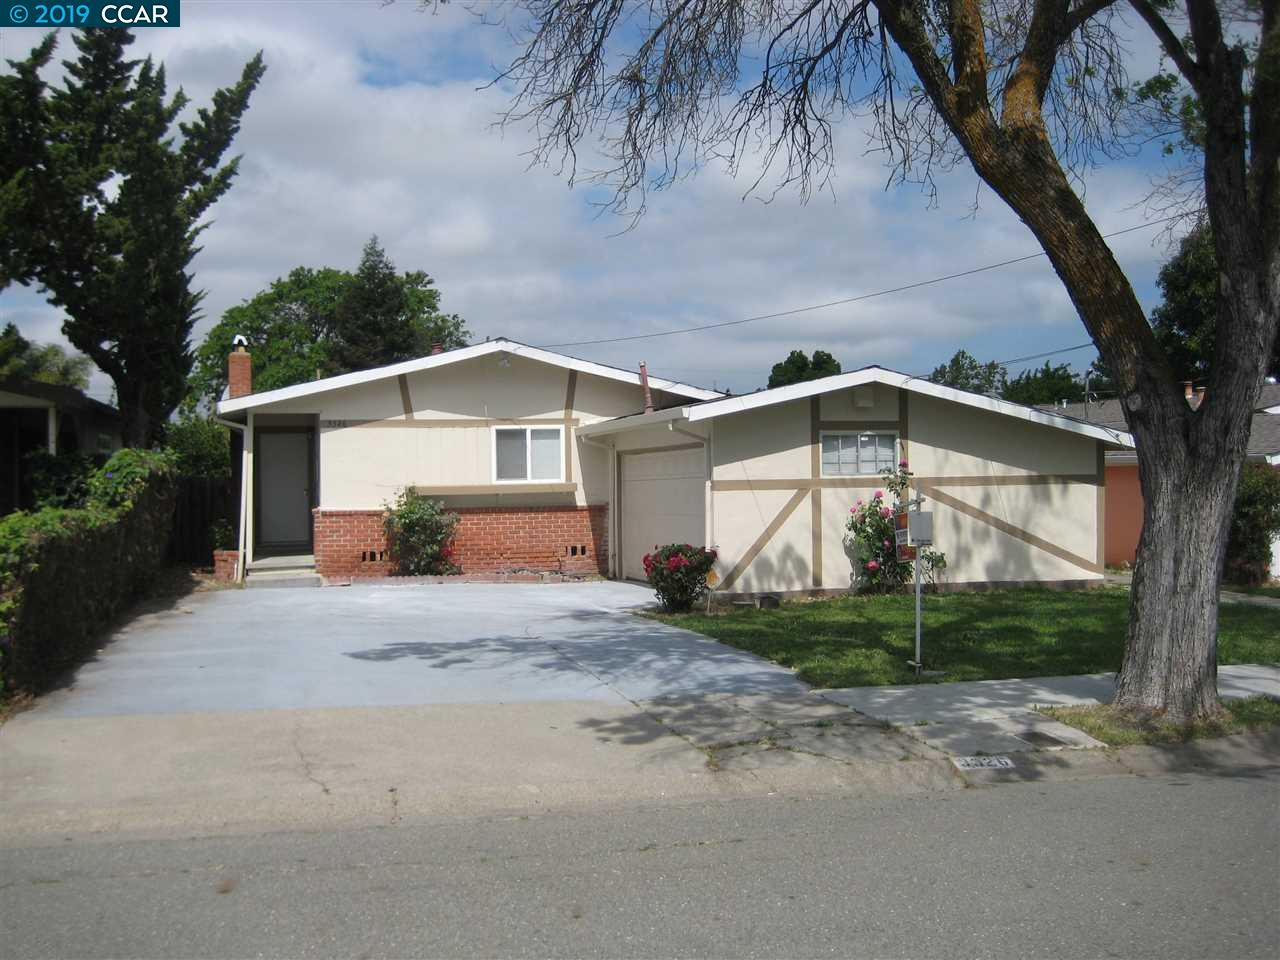 3326 CECELIA WAY, PITTSBURG, CA 94565